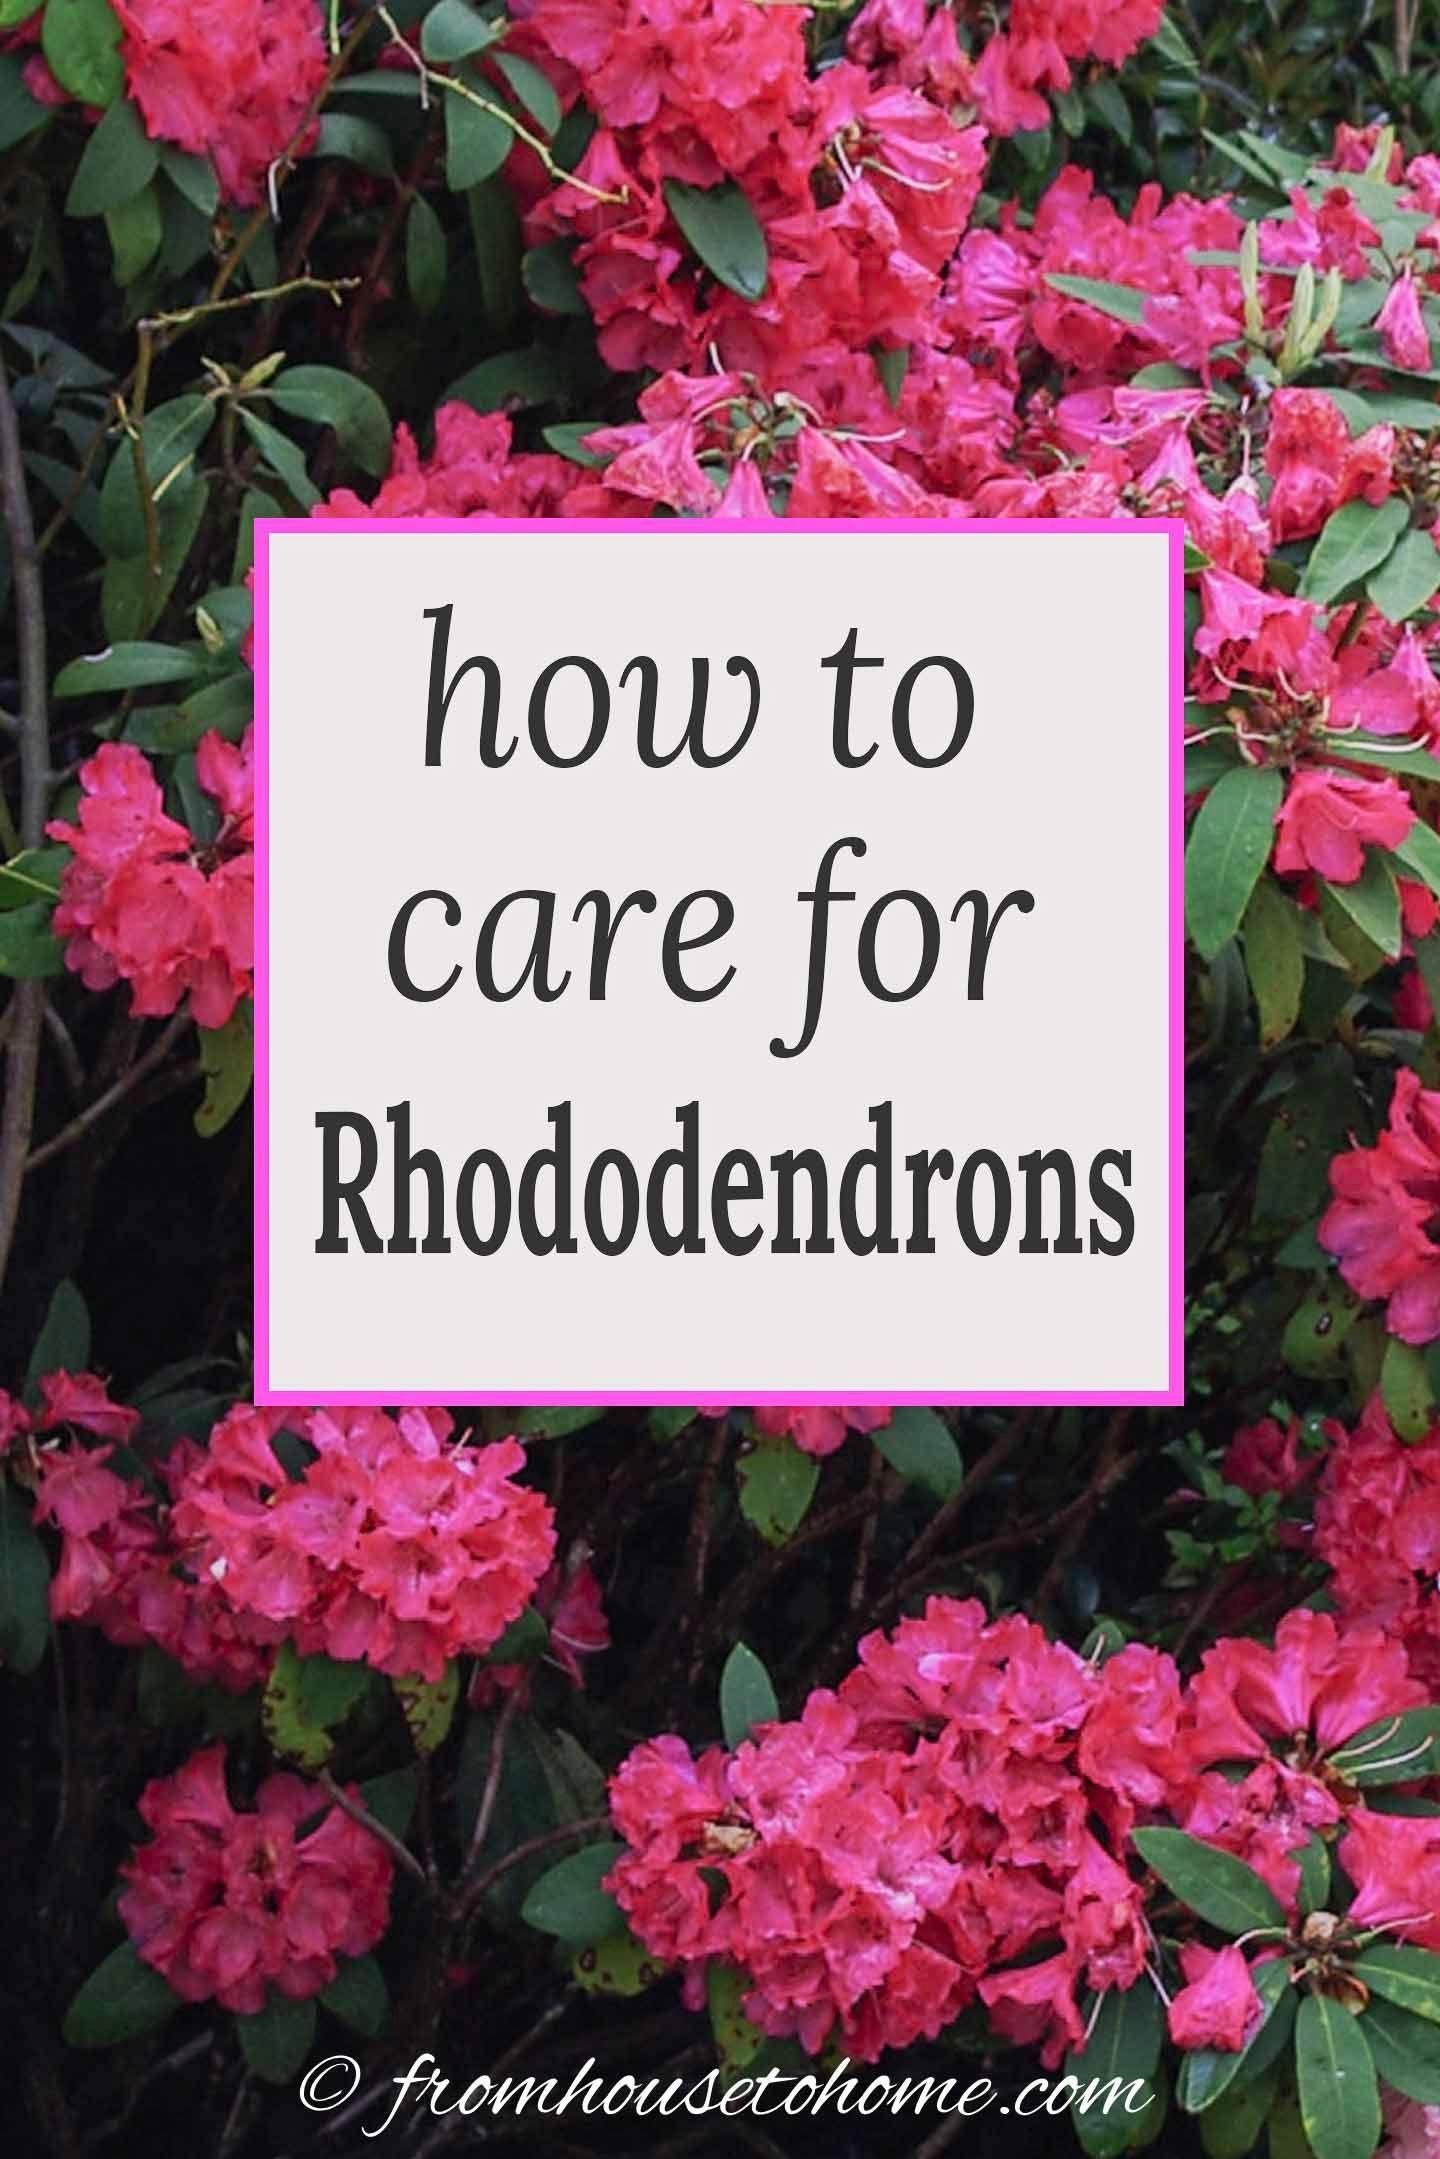 09894d707ffdca2da10ee75d5fb4c3dd - Best Gardens For Azaleas And Rhododendrons